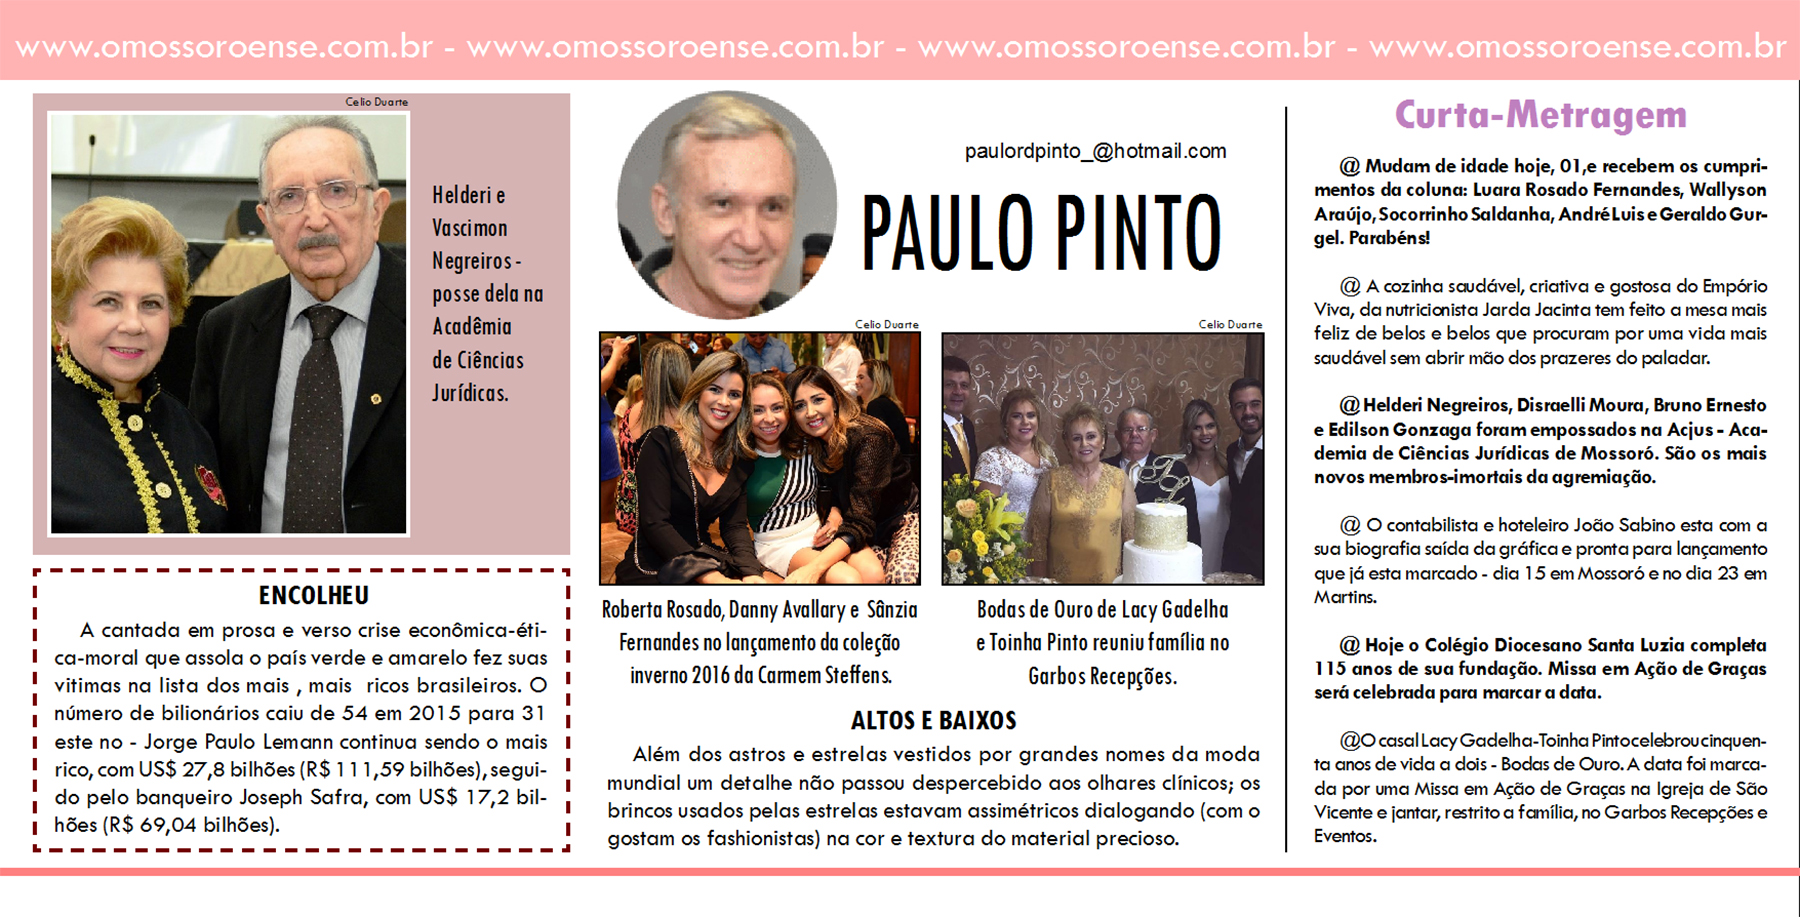 PAULO-PINTO- 01-03-16